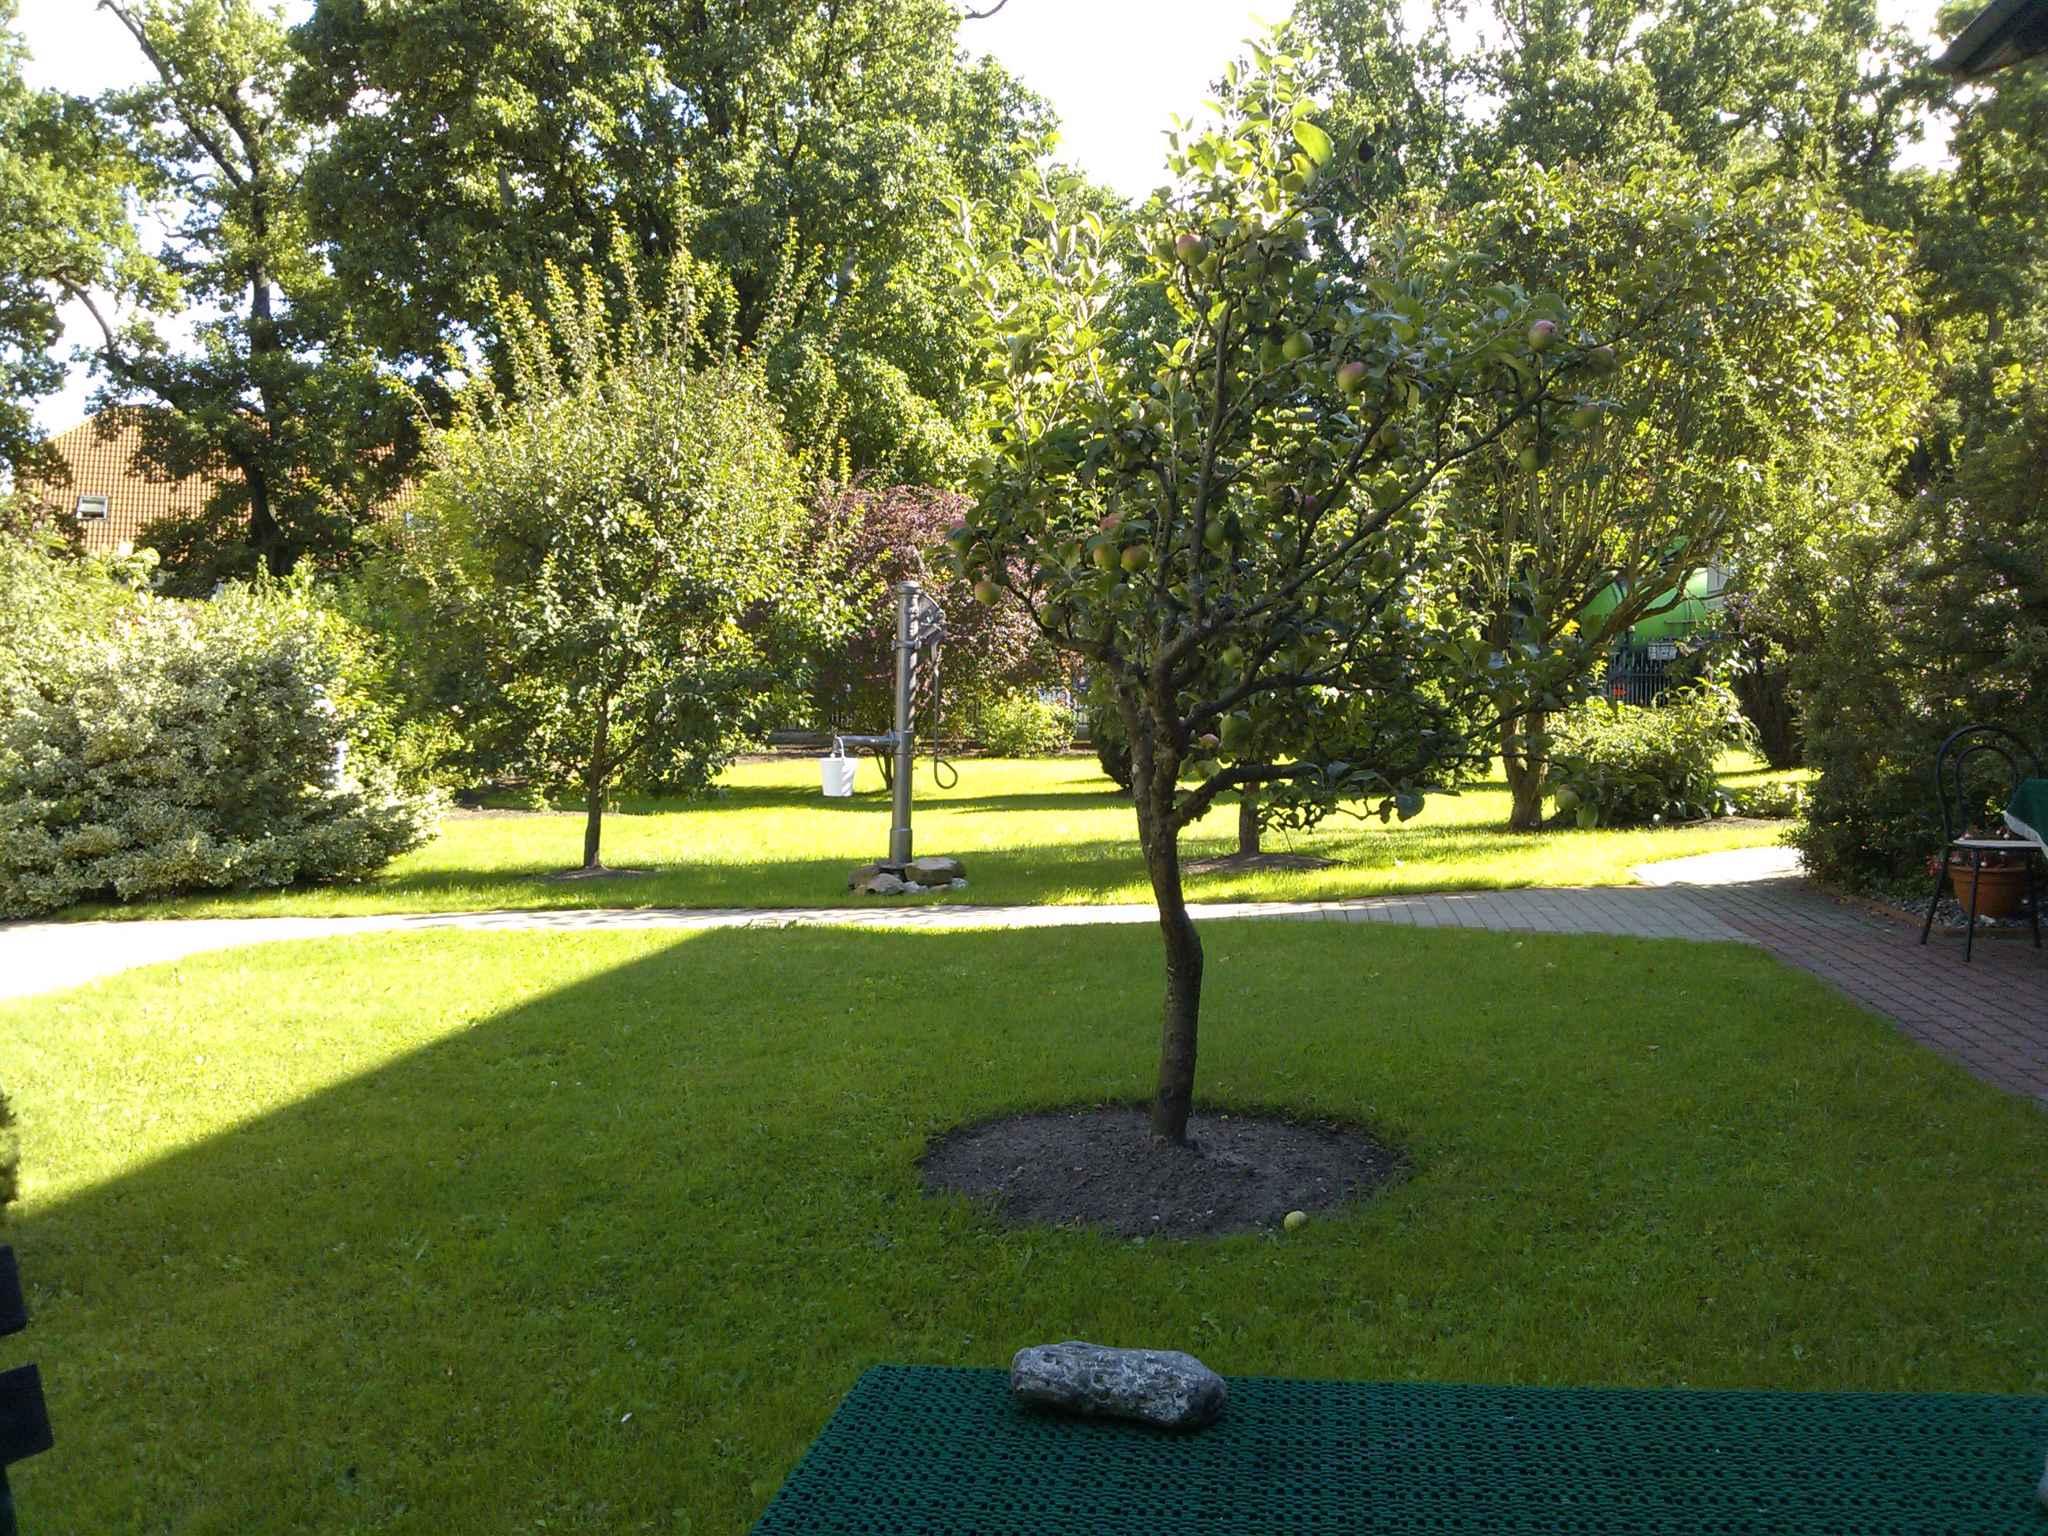 Studio mit Garten